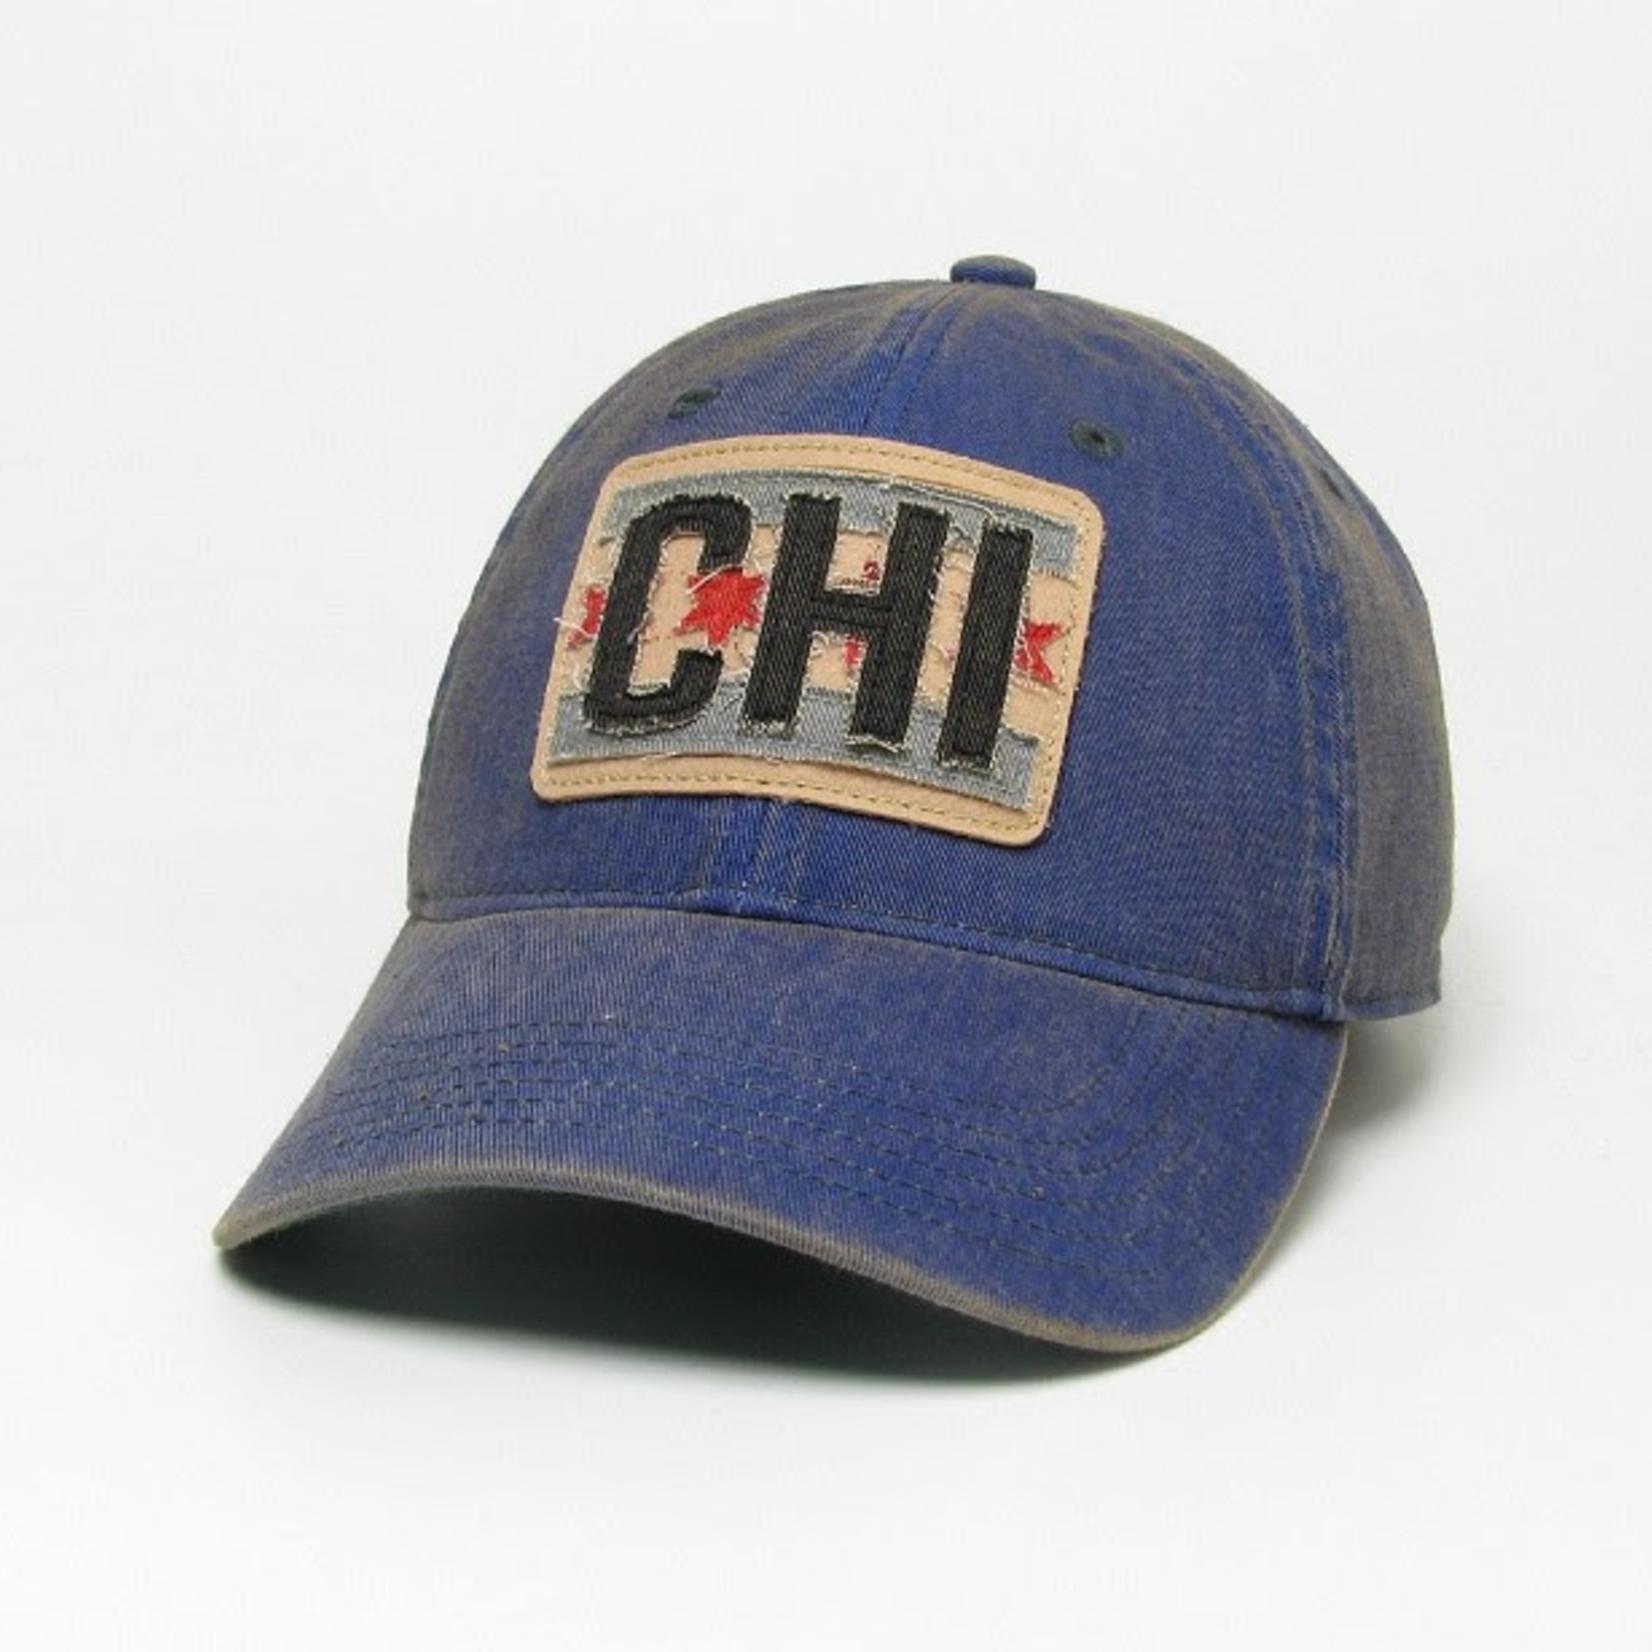 League League Legacy Trucker Hat with Chicago Flag Patch, Blue